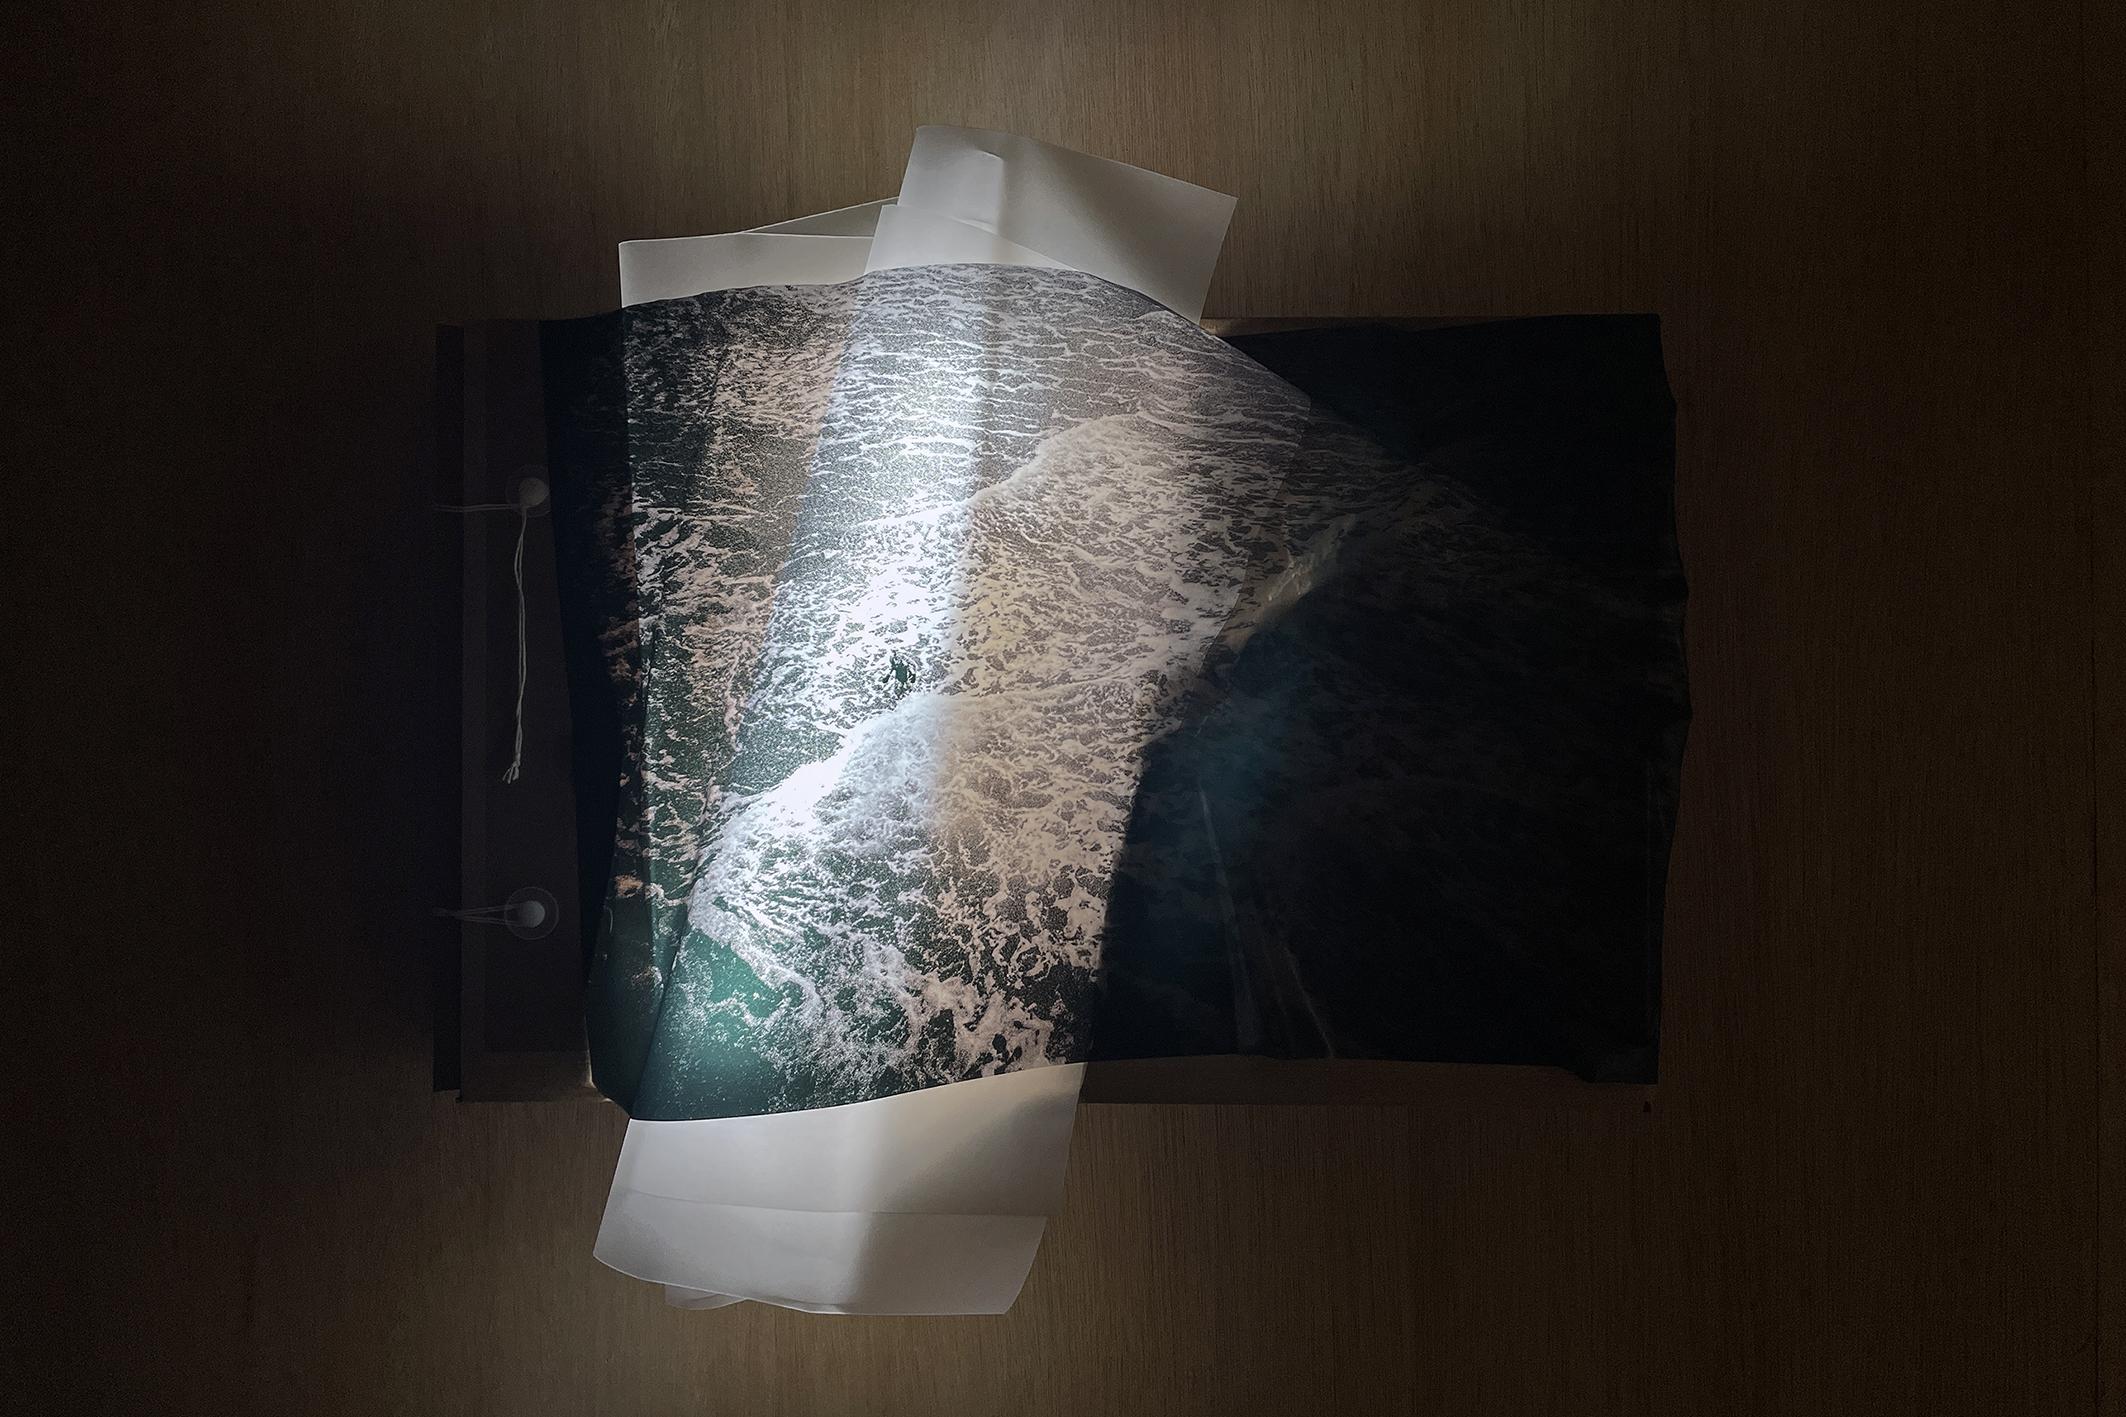 Nowhere II, Mixed media (image, LED light, carton), 36x54x6cm, 2021